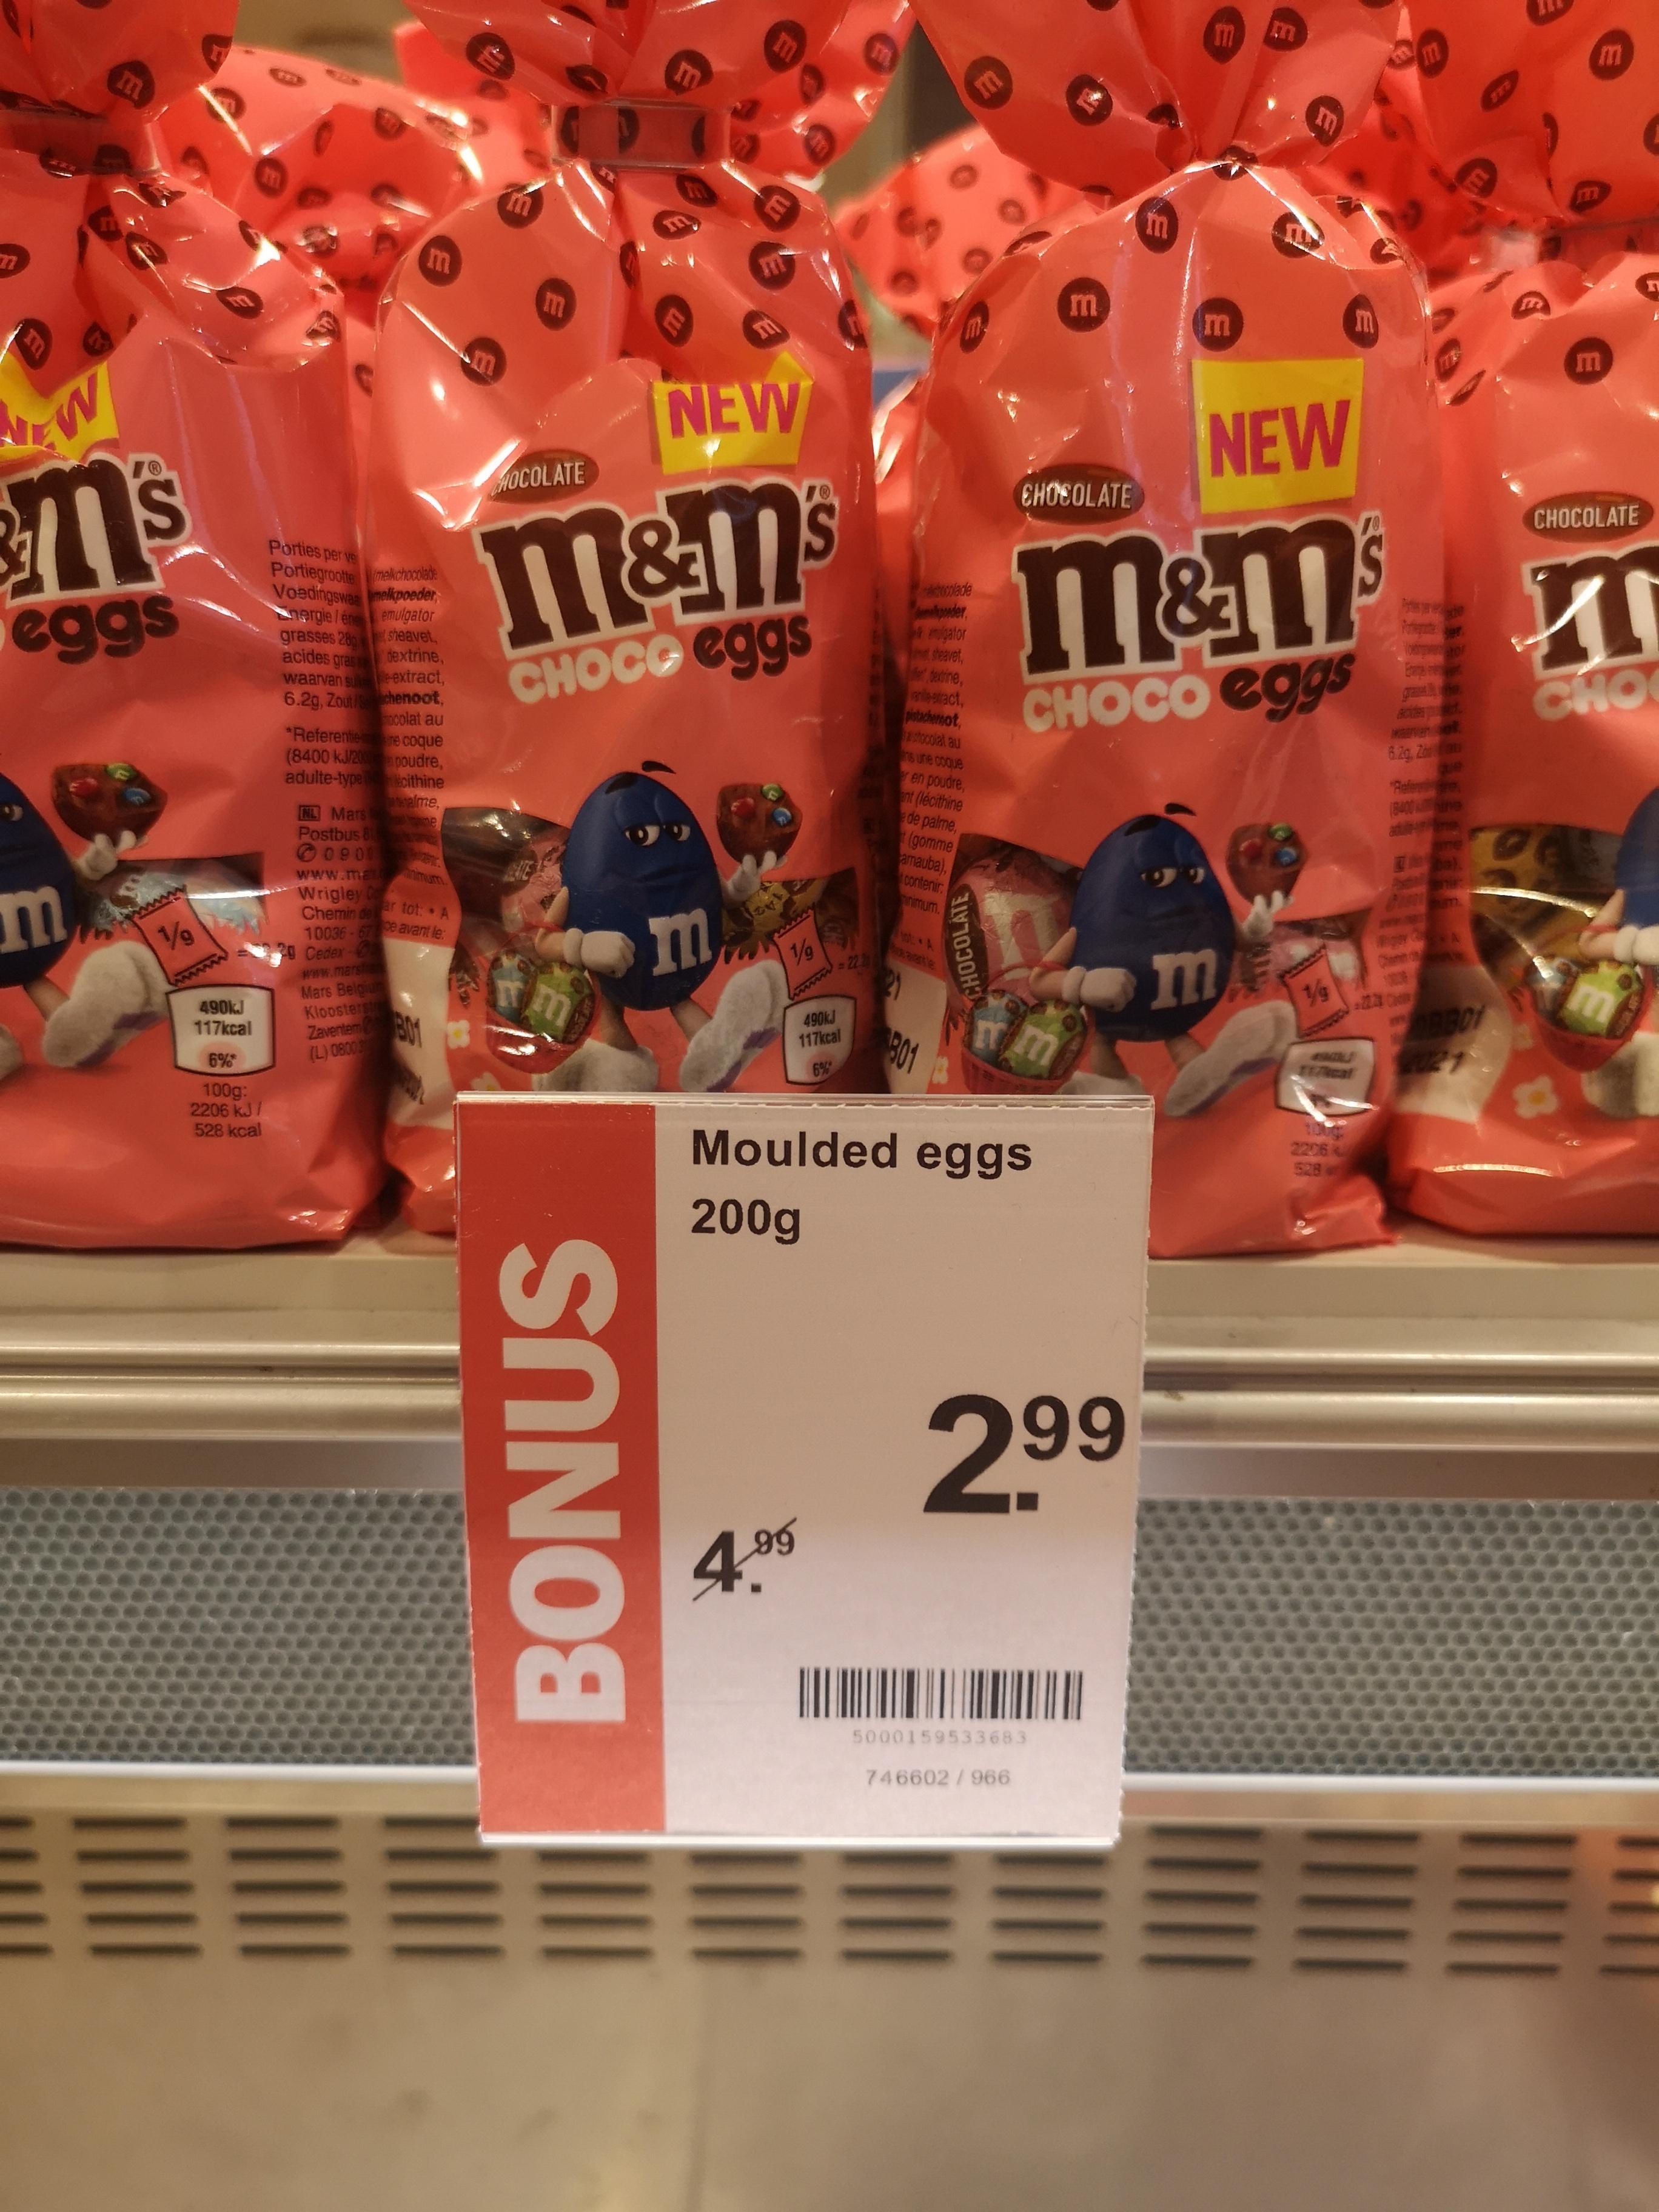 [lokaal?] M&M's choco eggs 40% korting @ Albert Heijn To Go